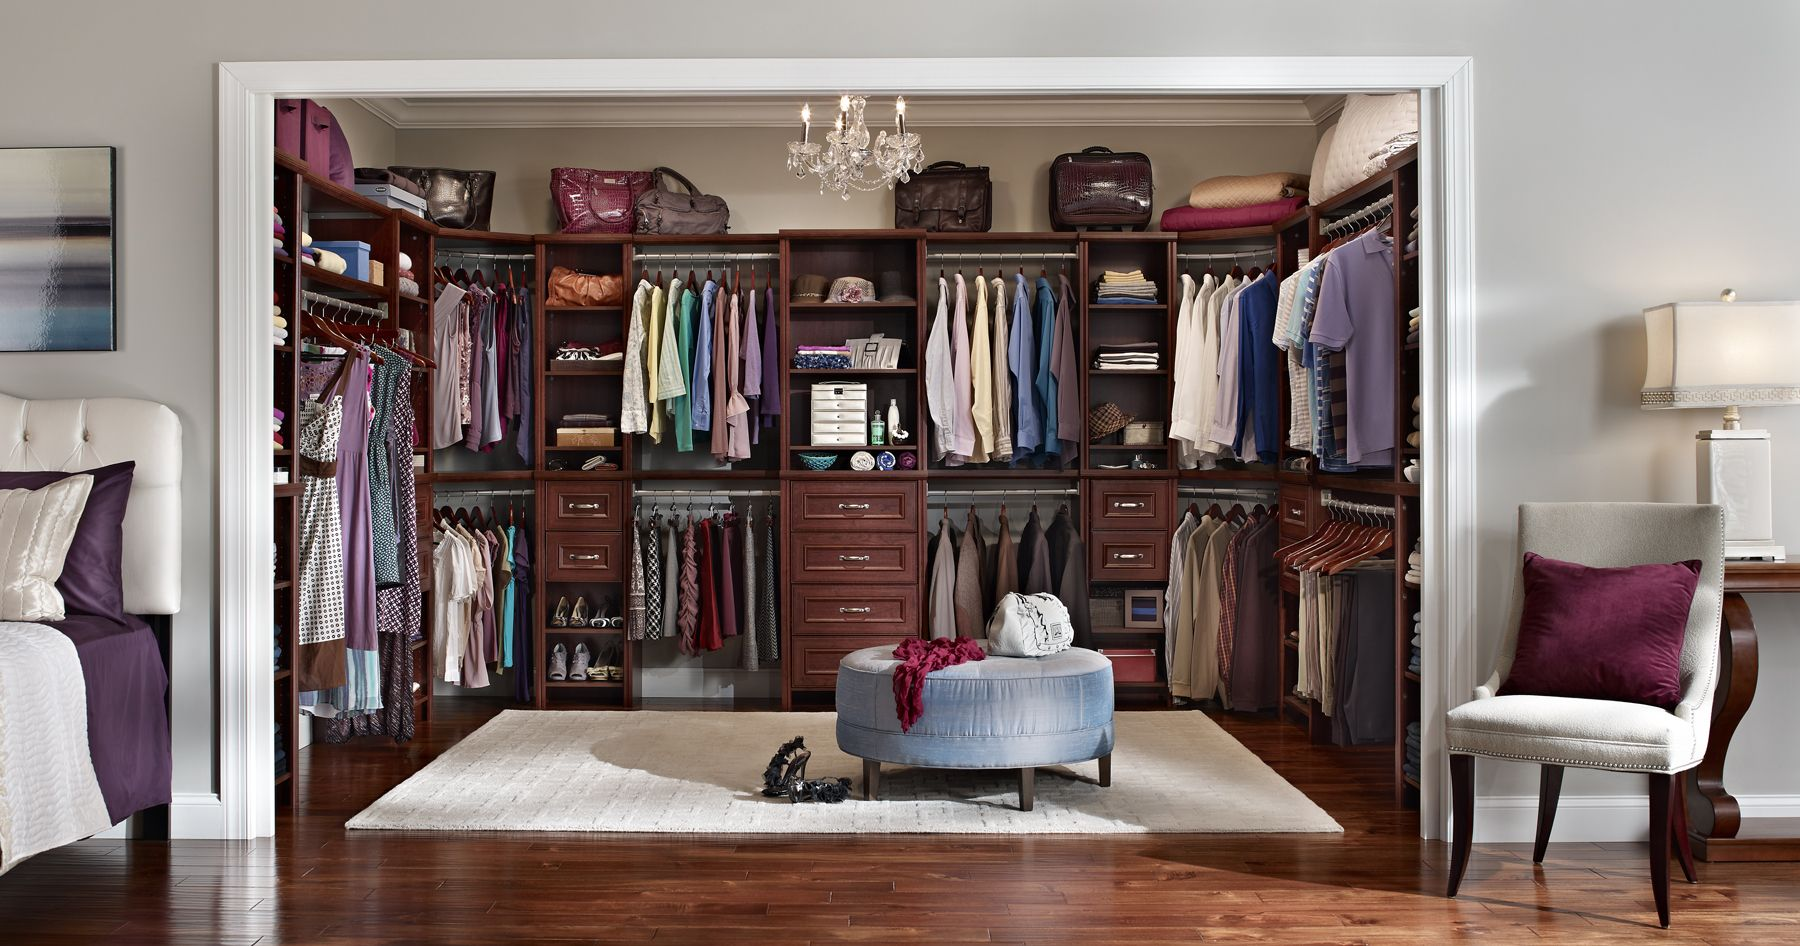 Master Bedroom Closet Design   Tips To Design Your Multifunctional Bedroom  Closet: